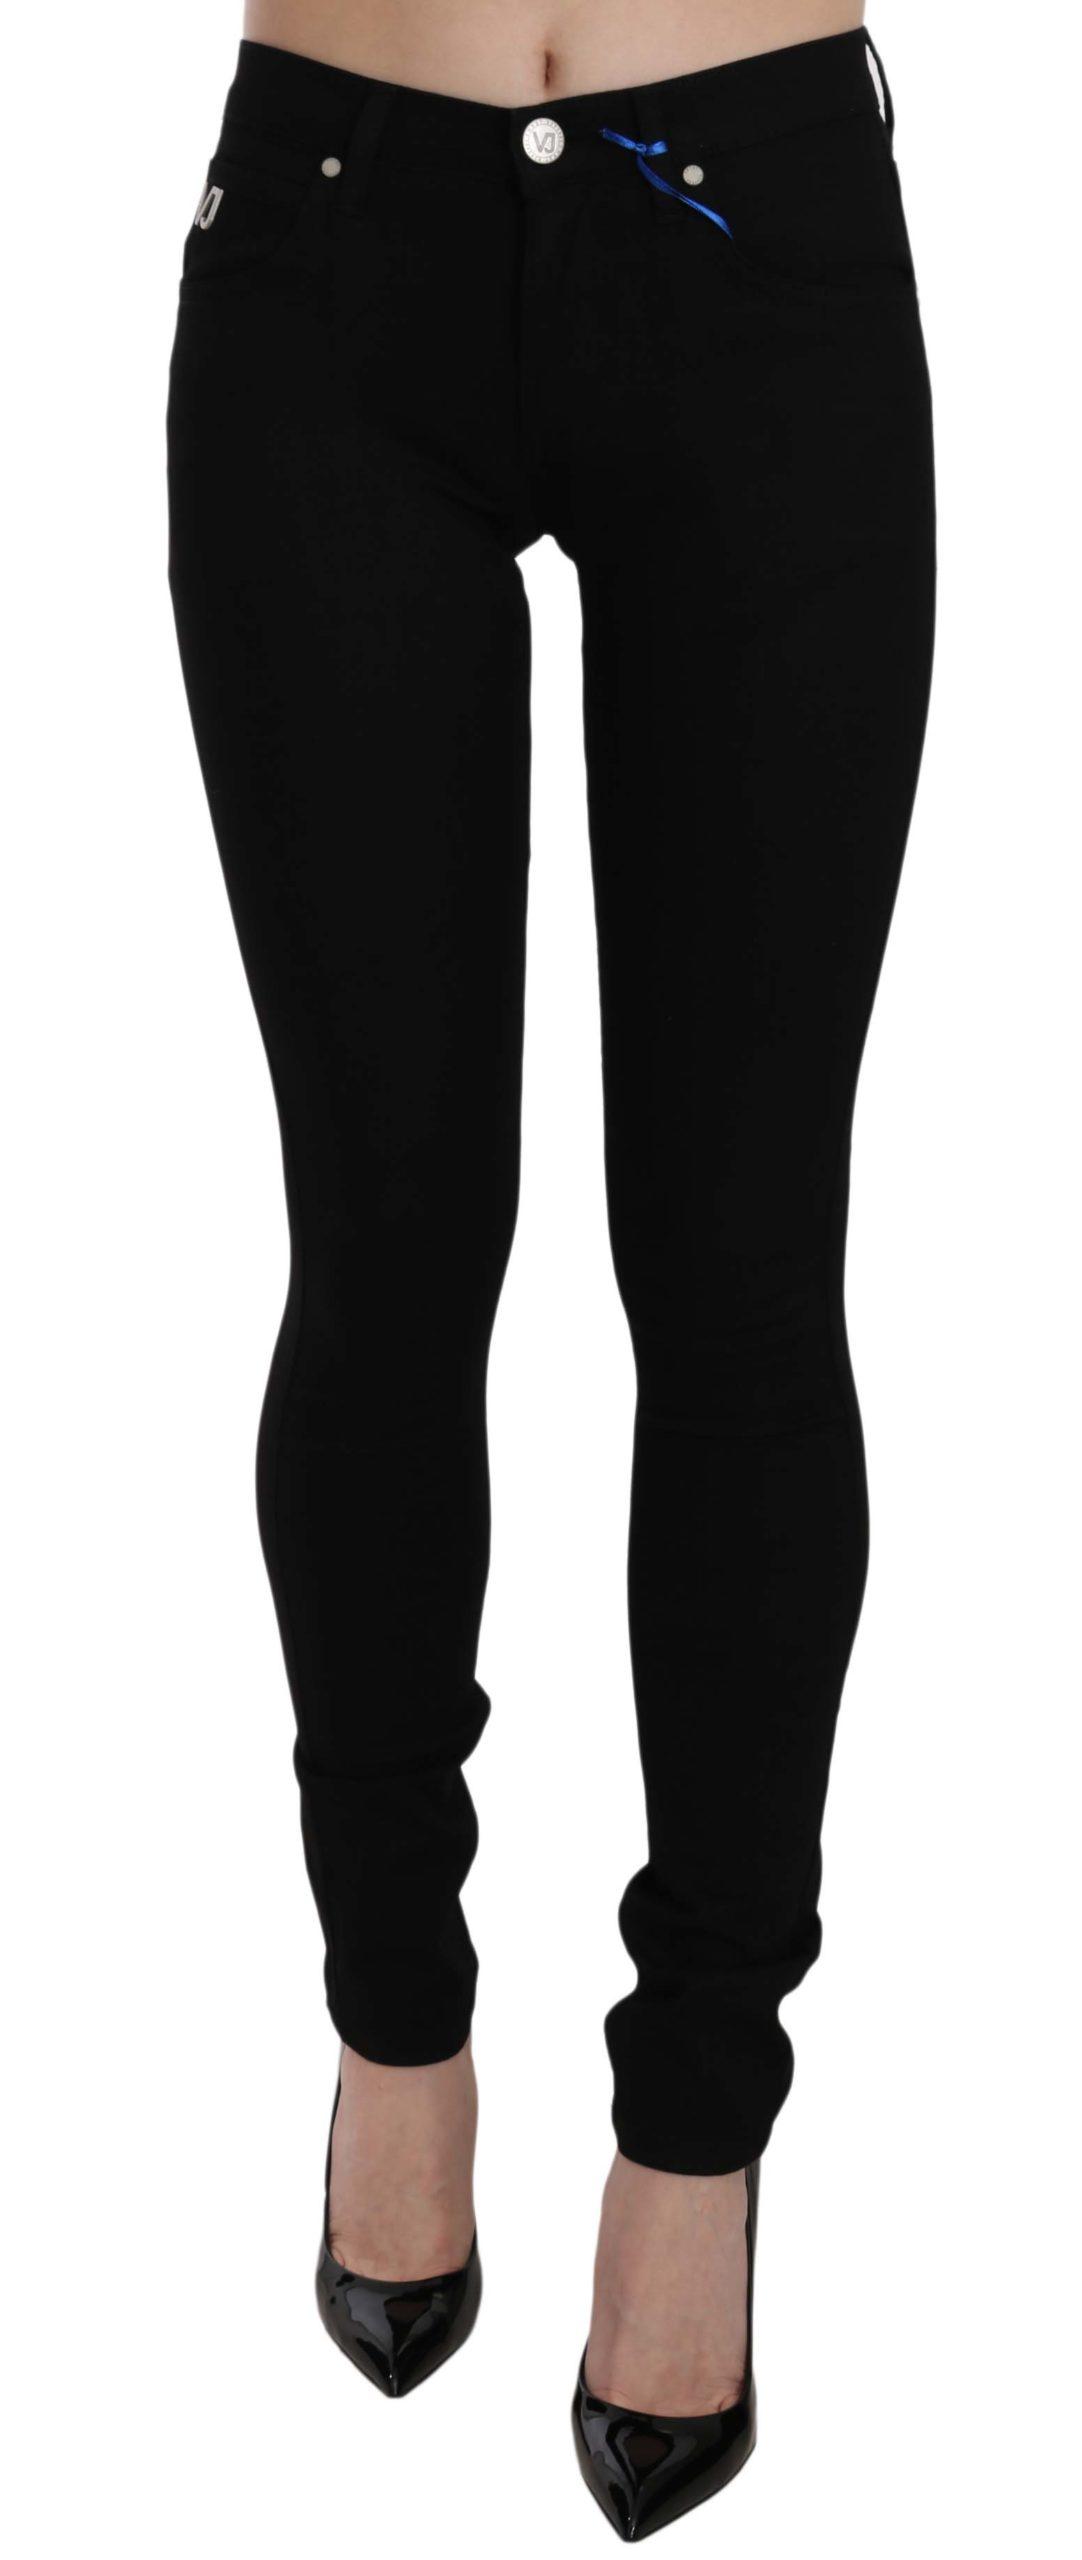 Versace Jeans Women's VJ Logo Denim Flat Skinny Fit Trouser Black PAN61007 - W33